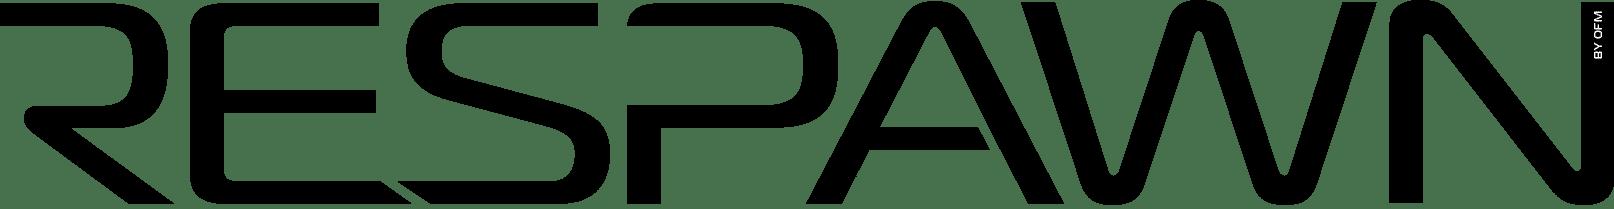 Respawn Logo